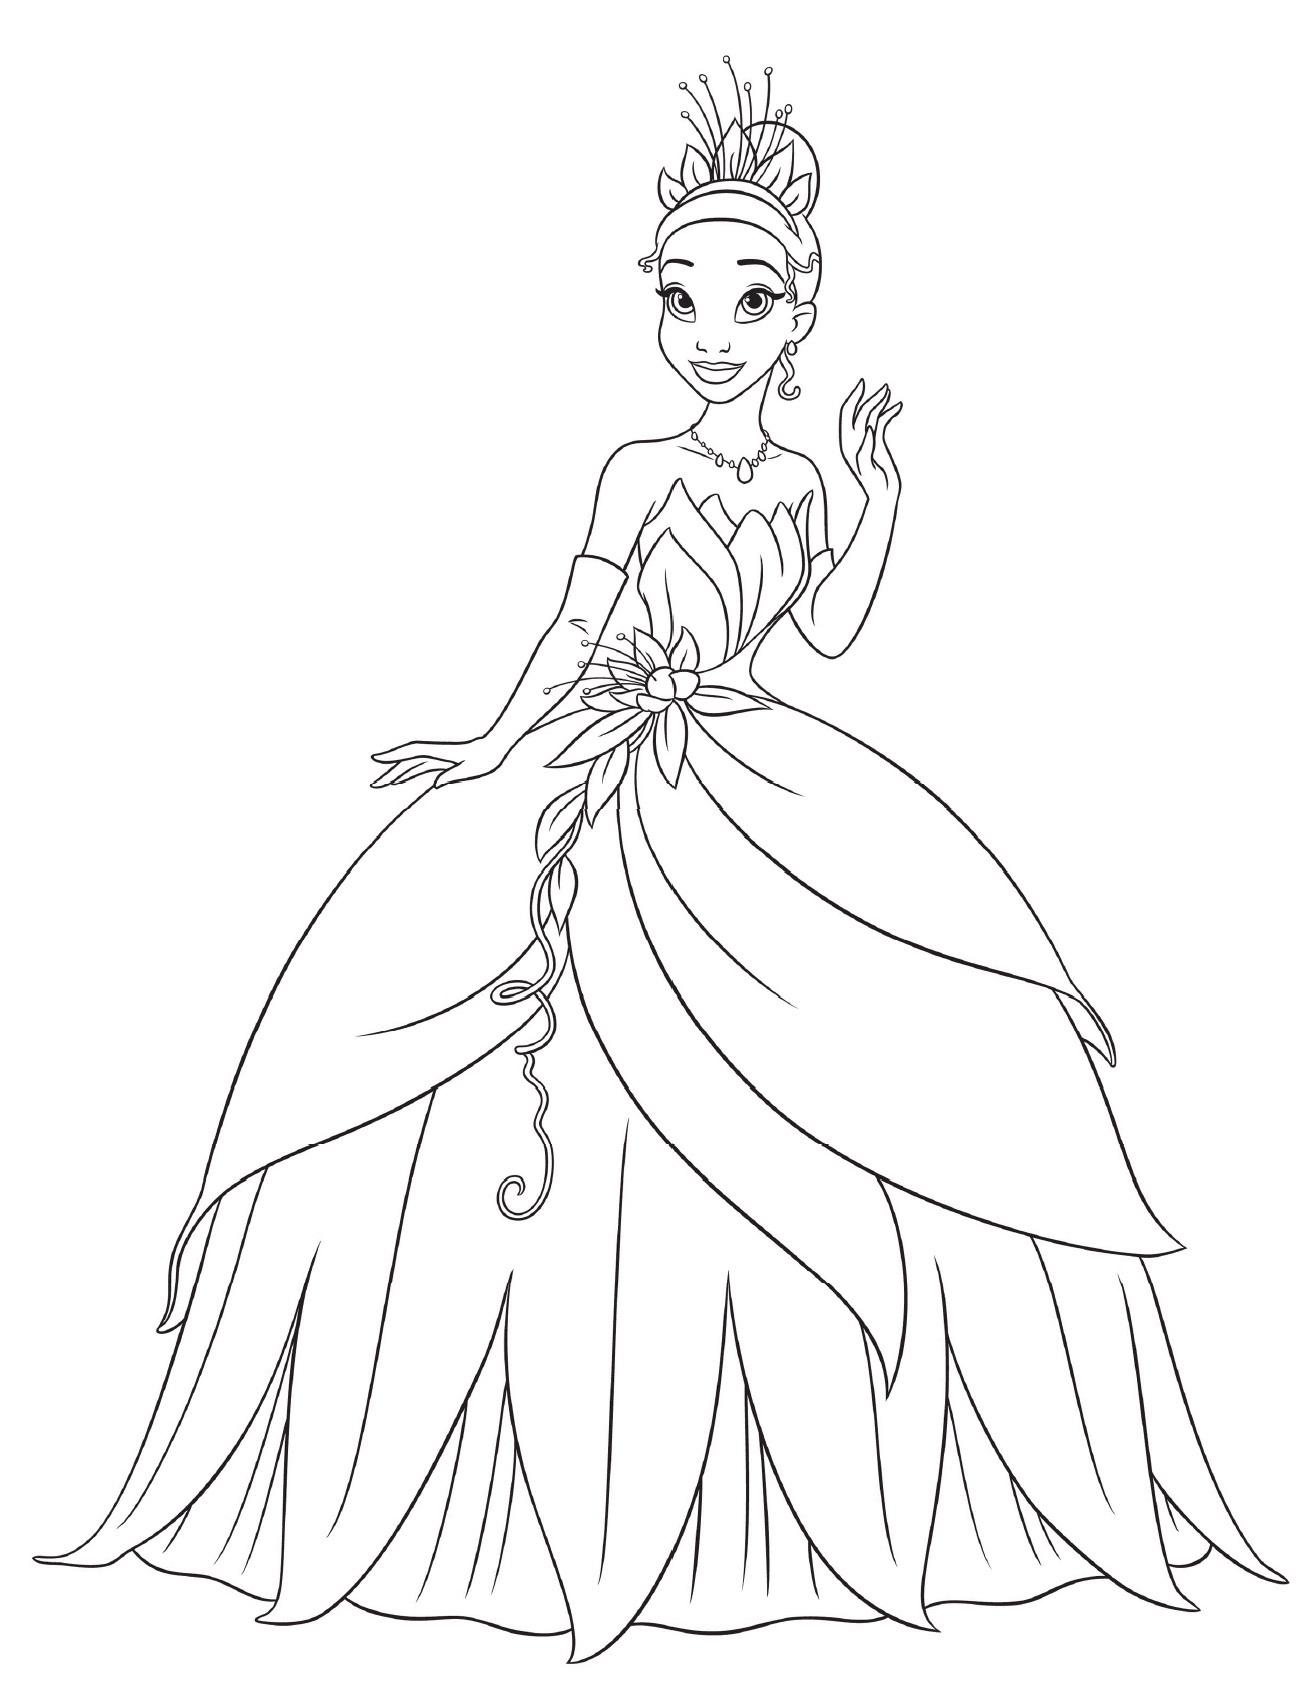 Printable Princess Tiana Coloring Pages